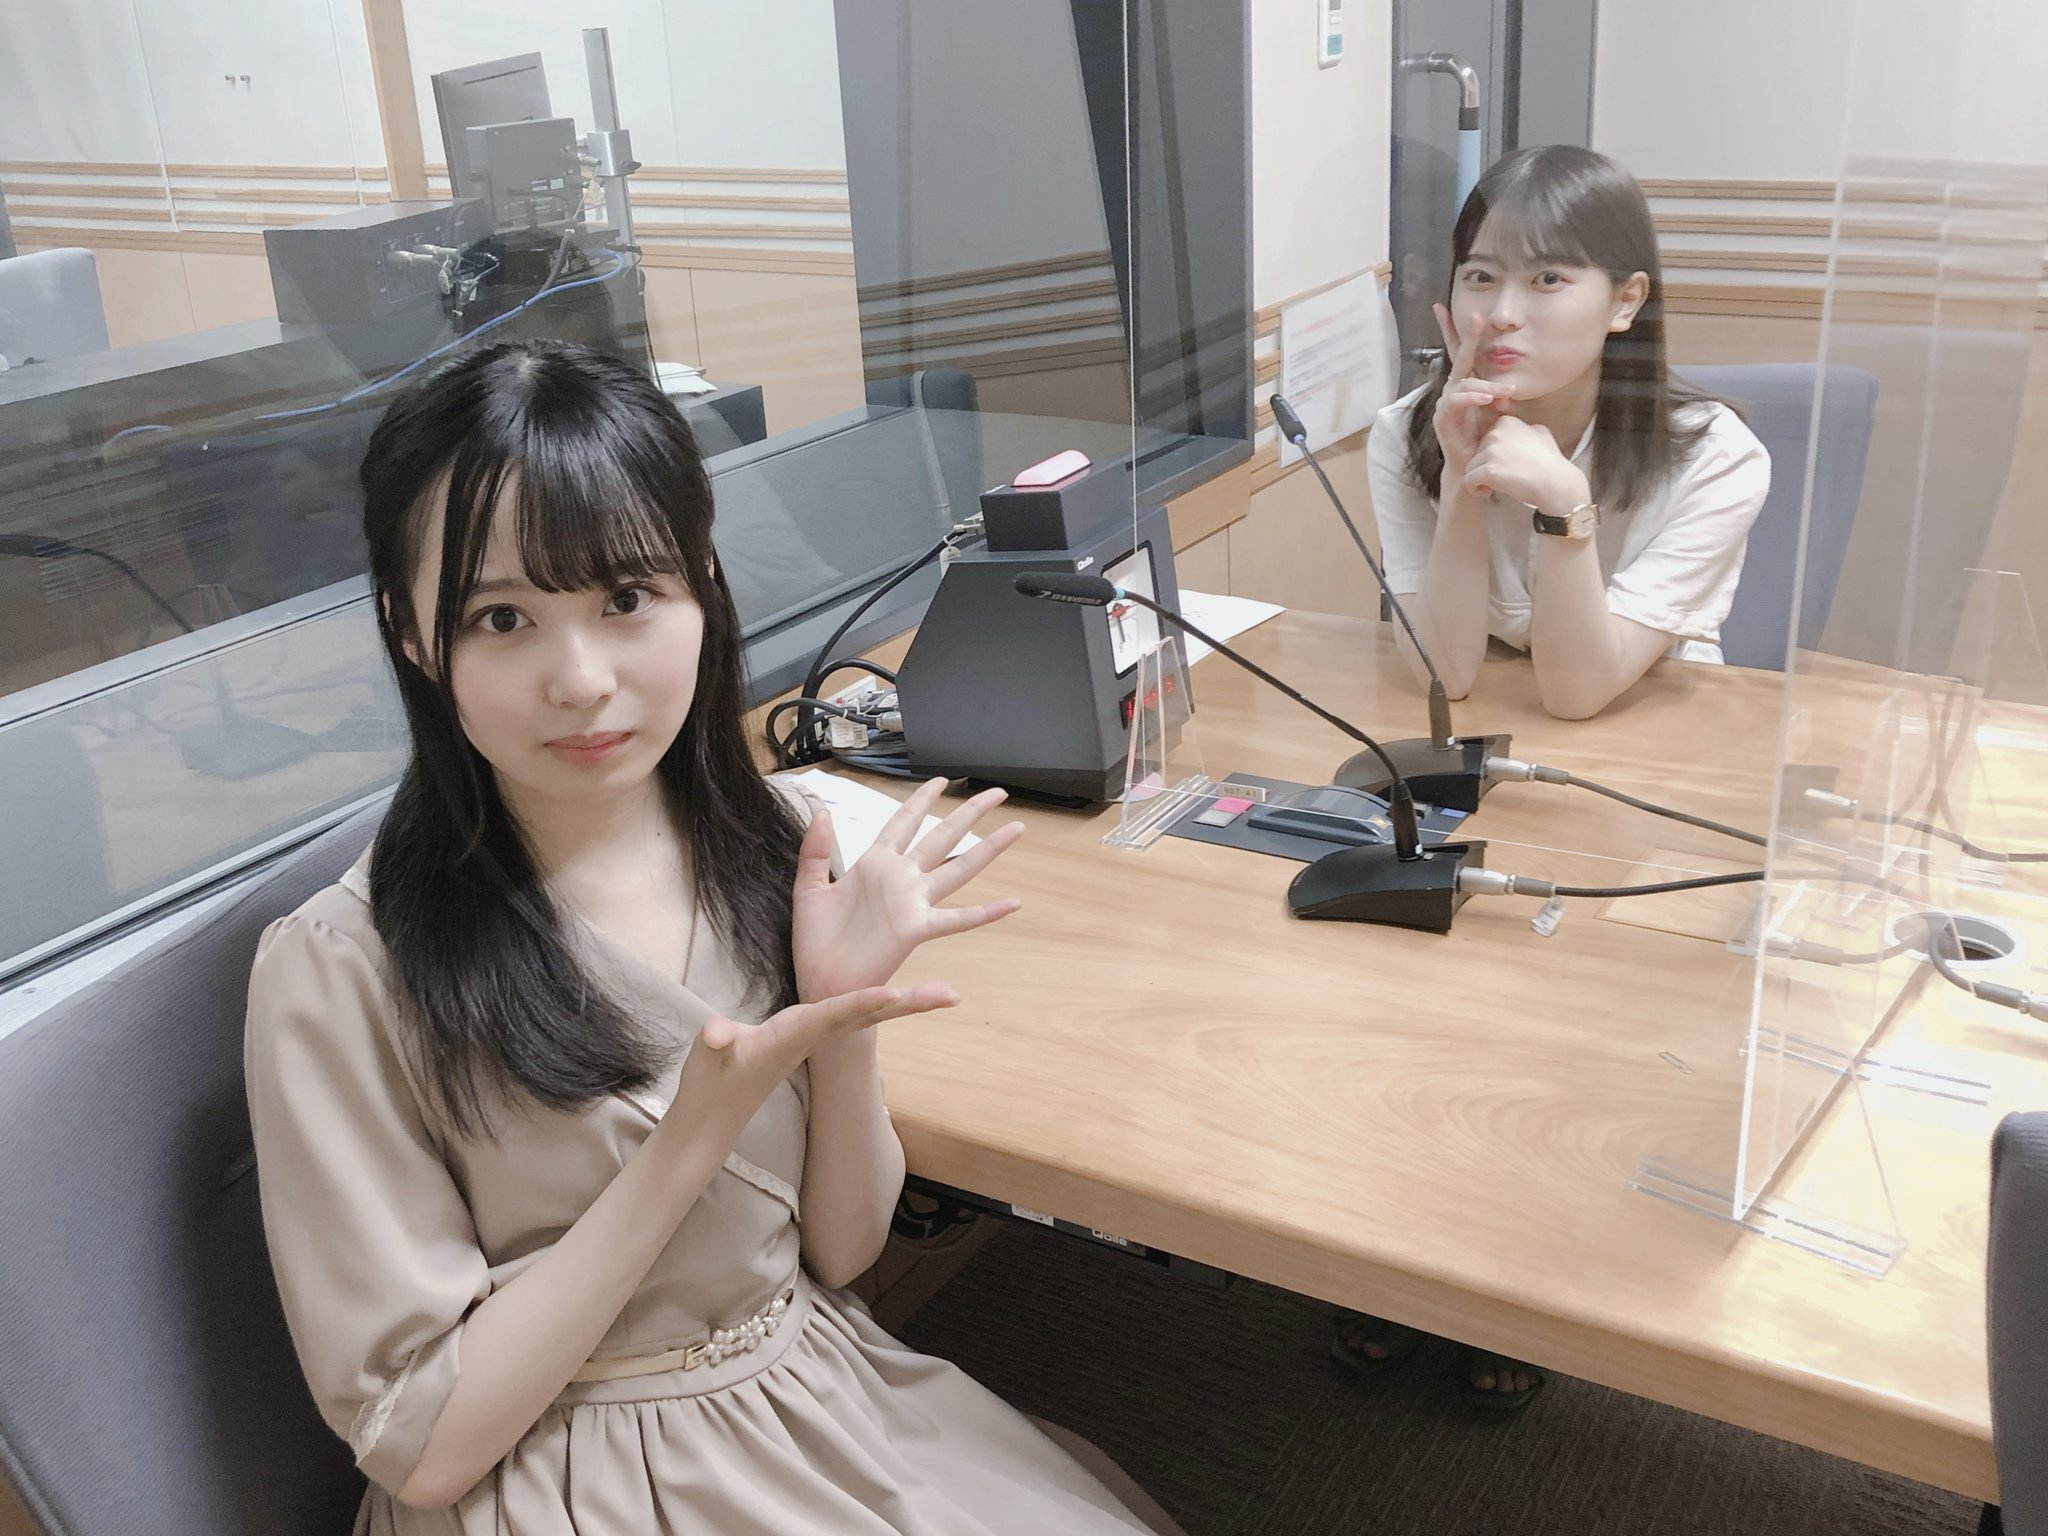 乃木坂46の「の」 佐藤璃果 岩本蓮加